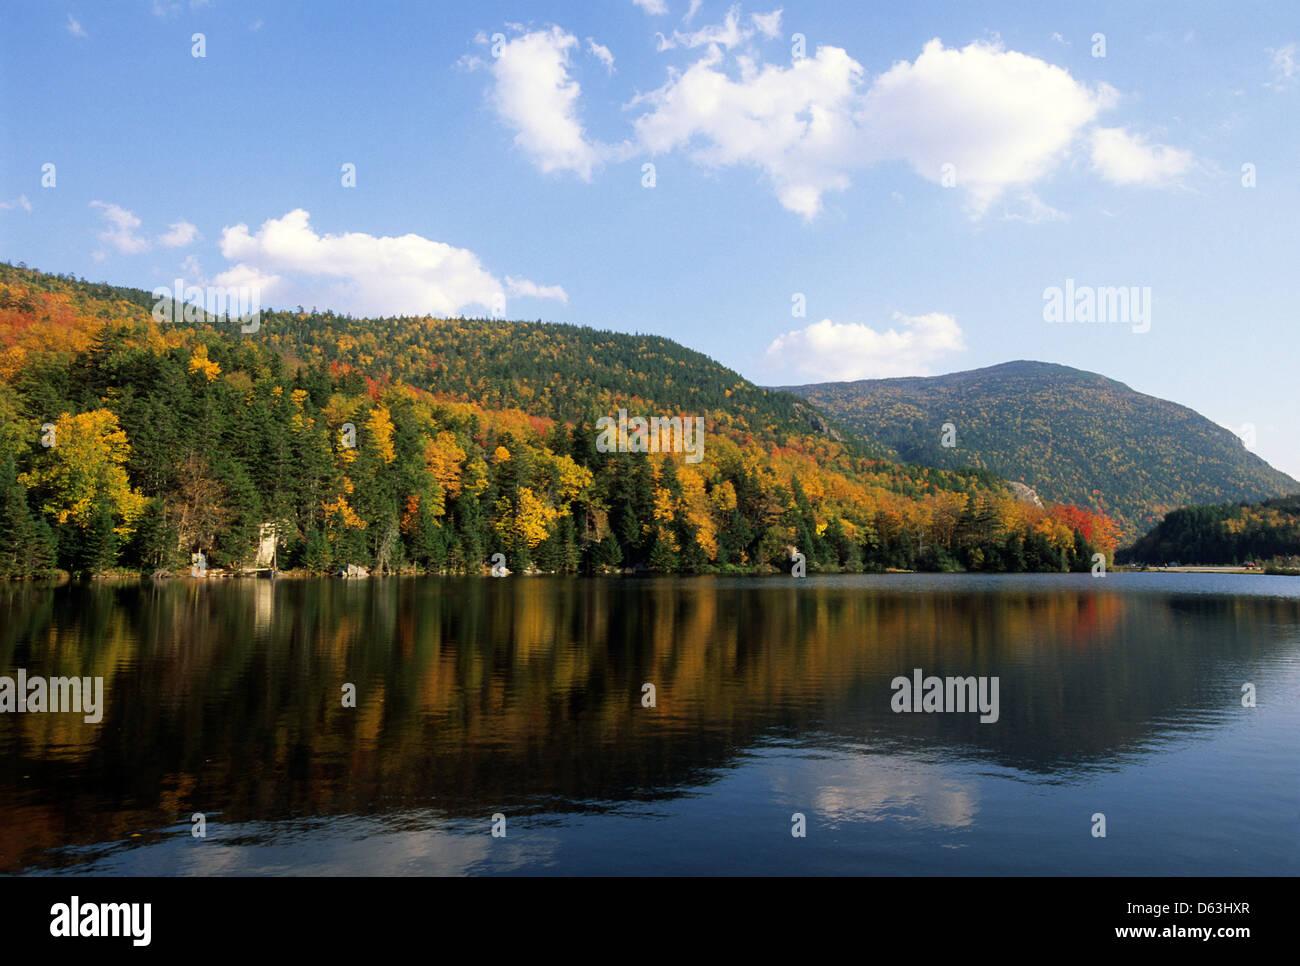 Elk281-1542 New Hampshire, White Mountains, Crawford Notch, Crawford Notch Lake Stock Photo